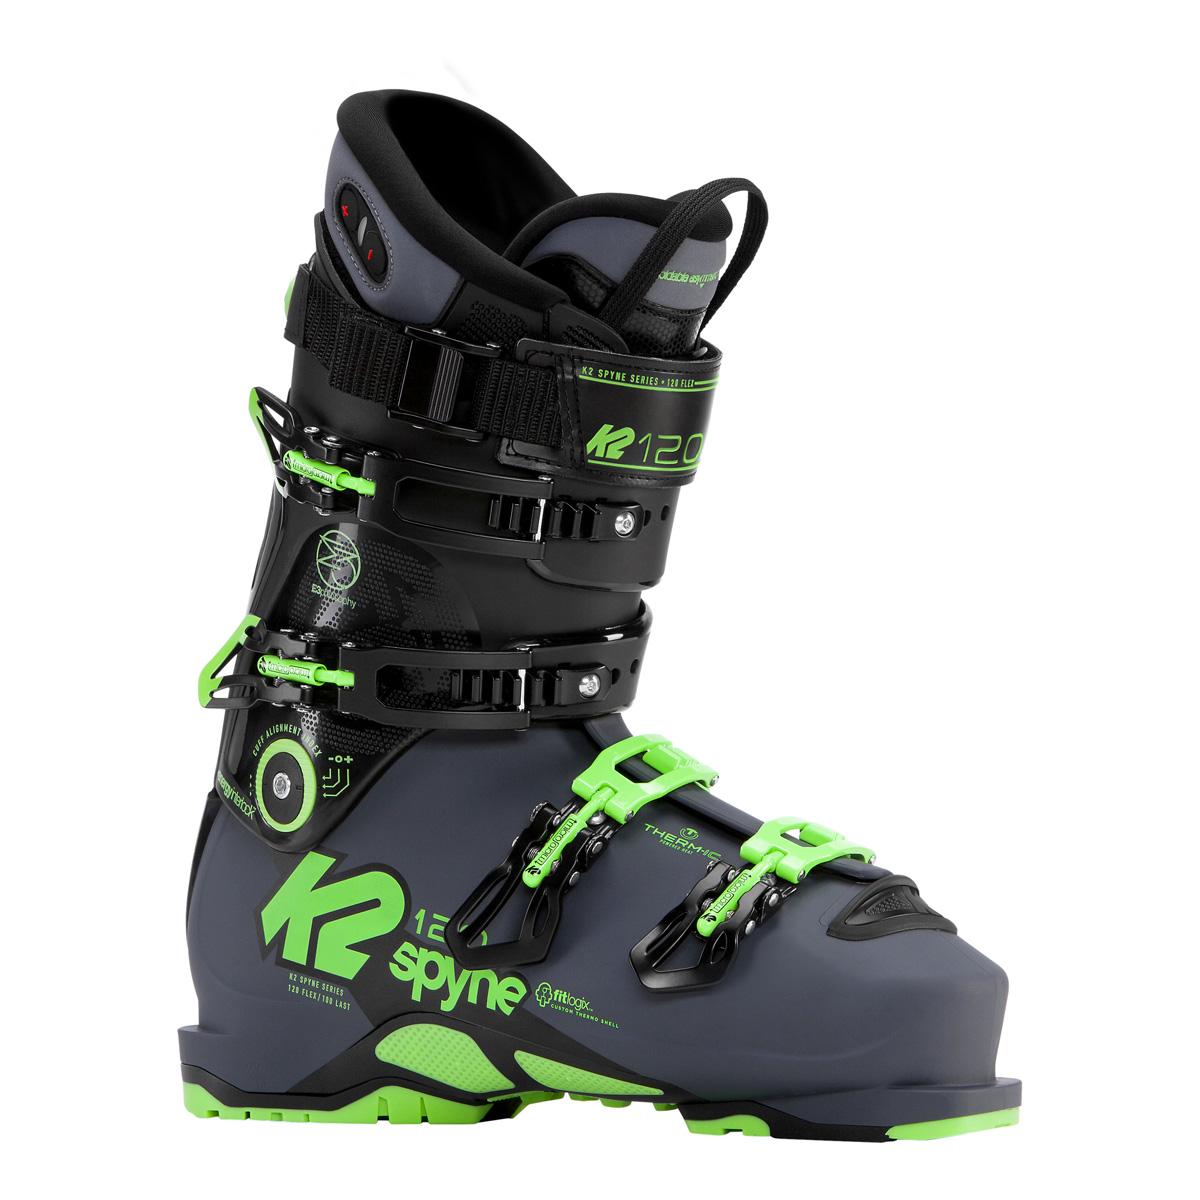 K2 Spyne 120 Heated Boots $900